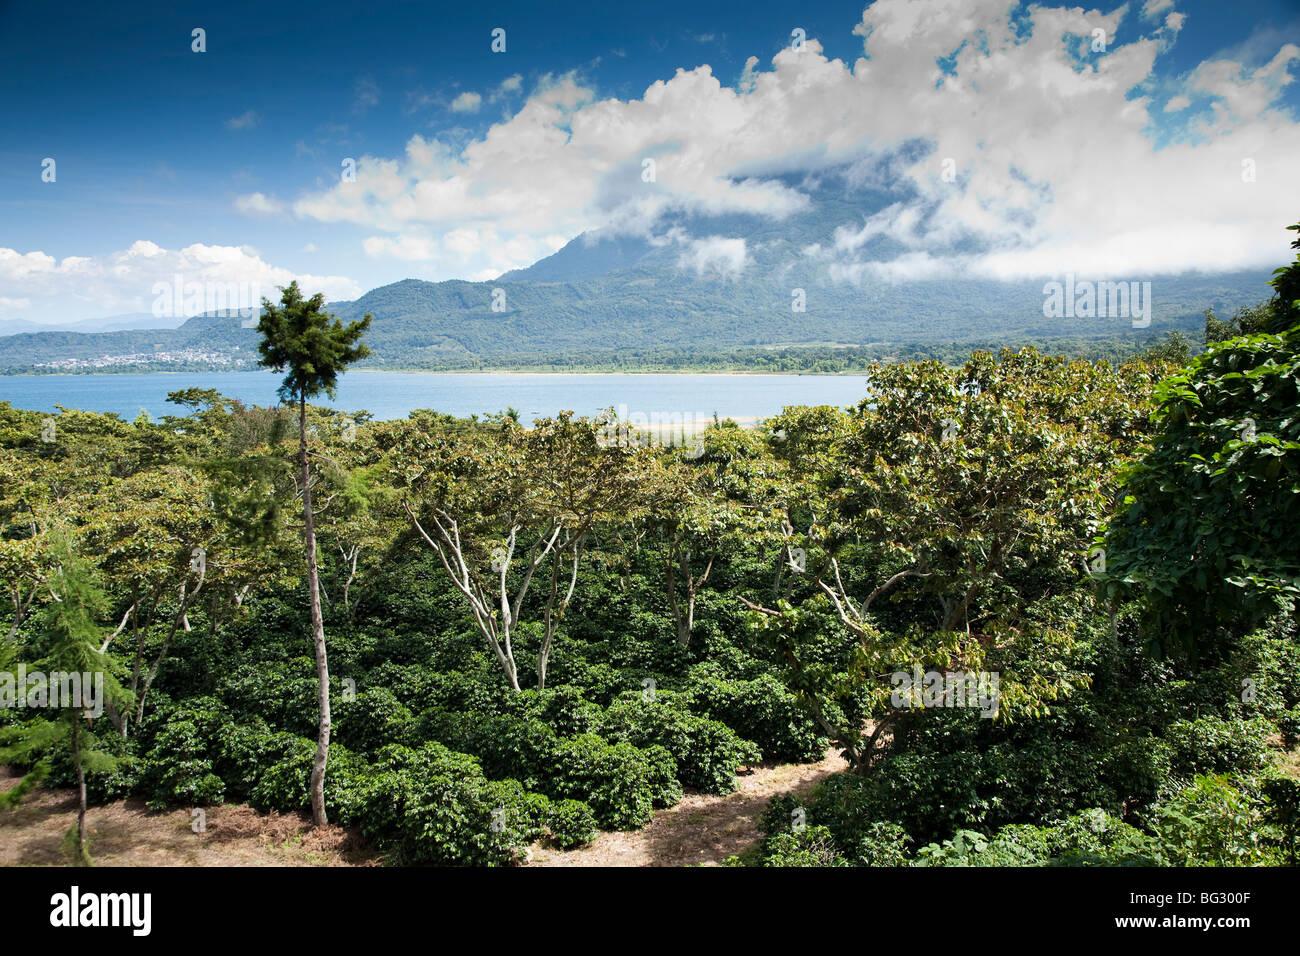 Coffee Finca near San Lucas Toliman Lake Atitlan Guatemala. - Stock Image